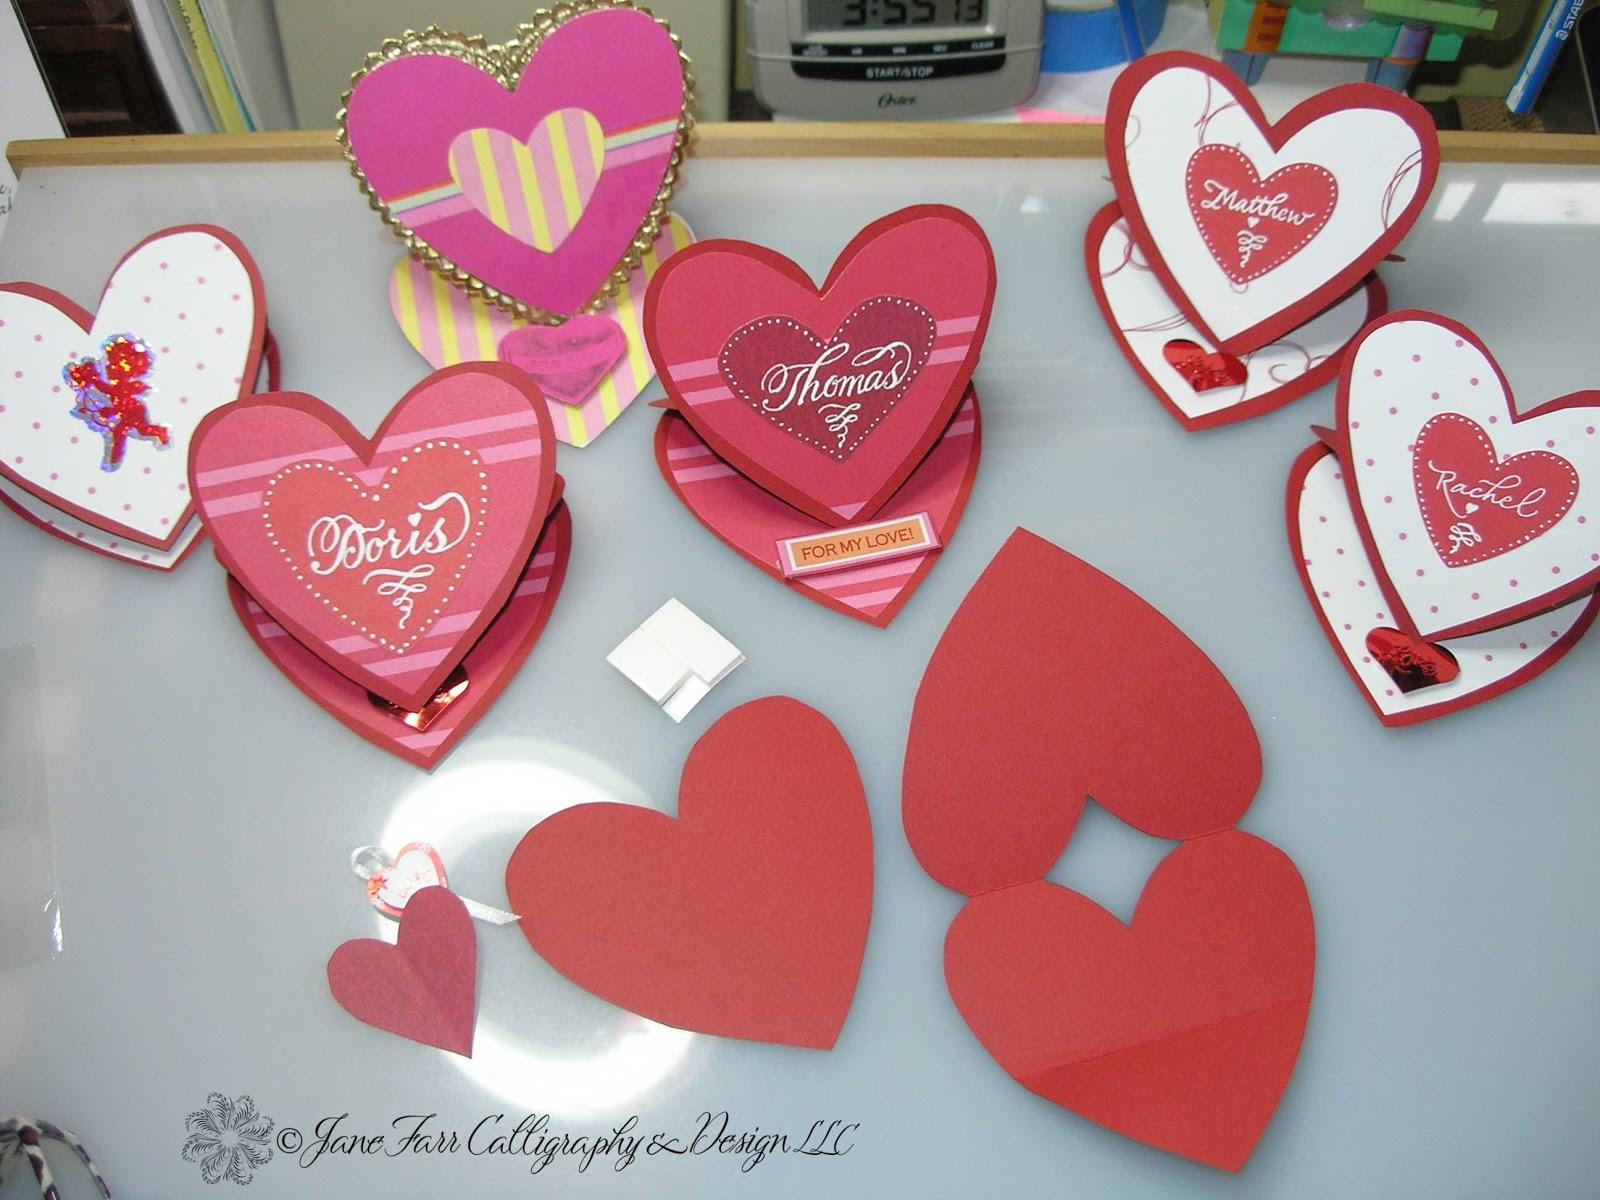 A Place To Flourish Calligraphy Flourish Friday Valentine Cards – Thomas Valentine Cards